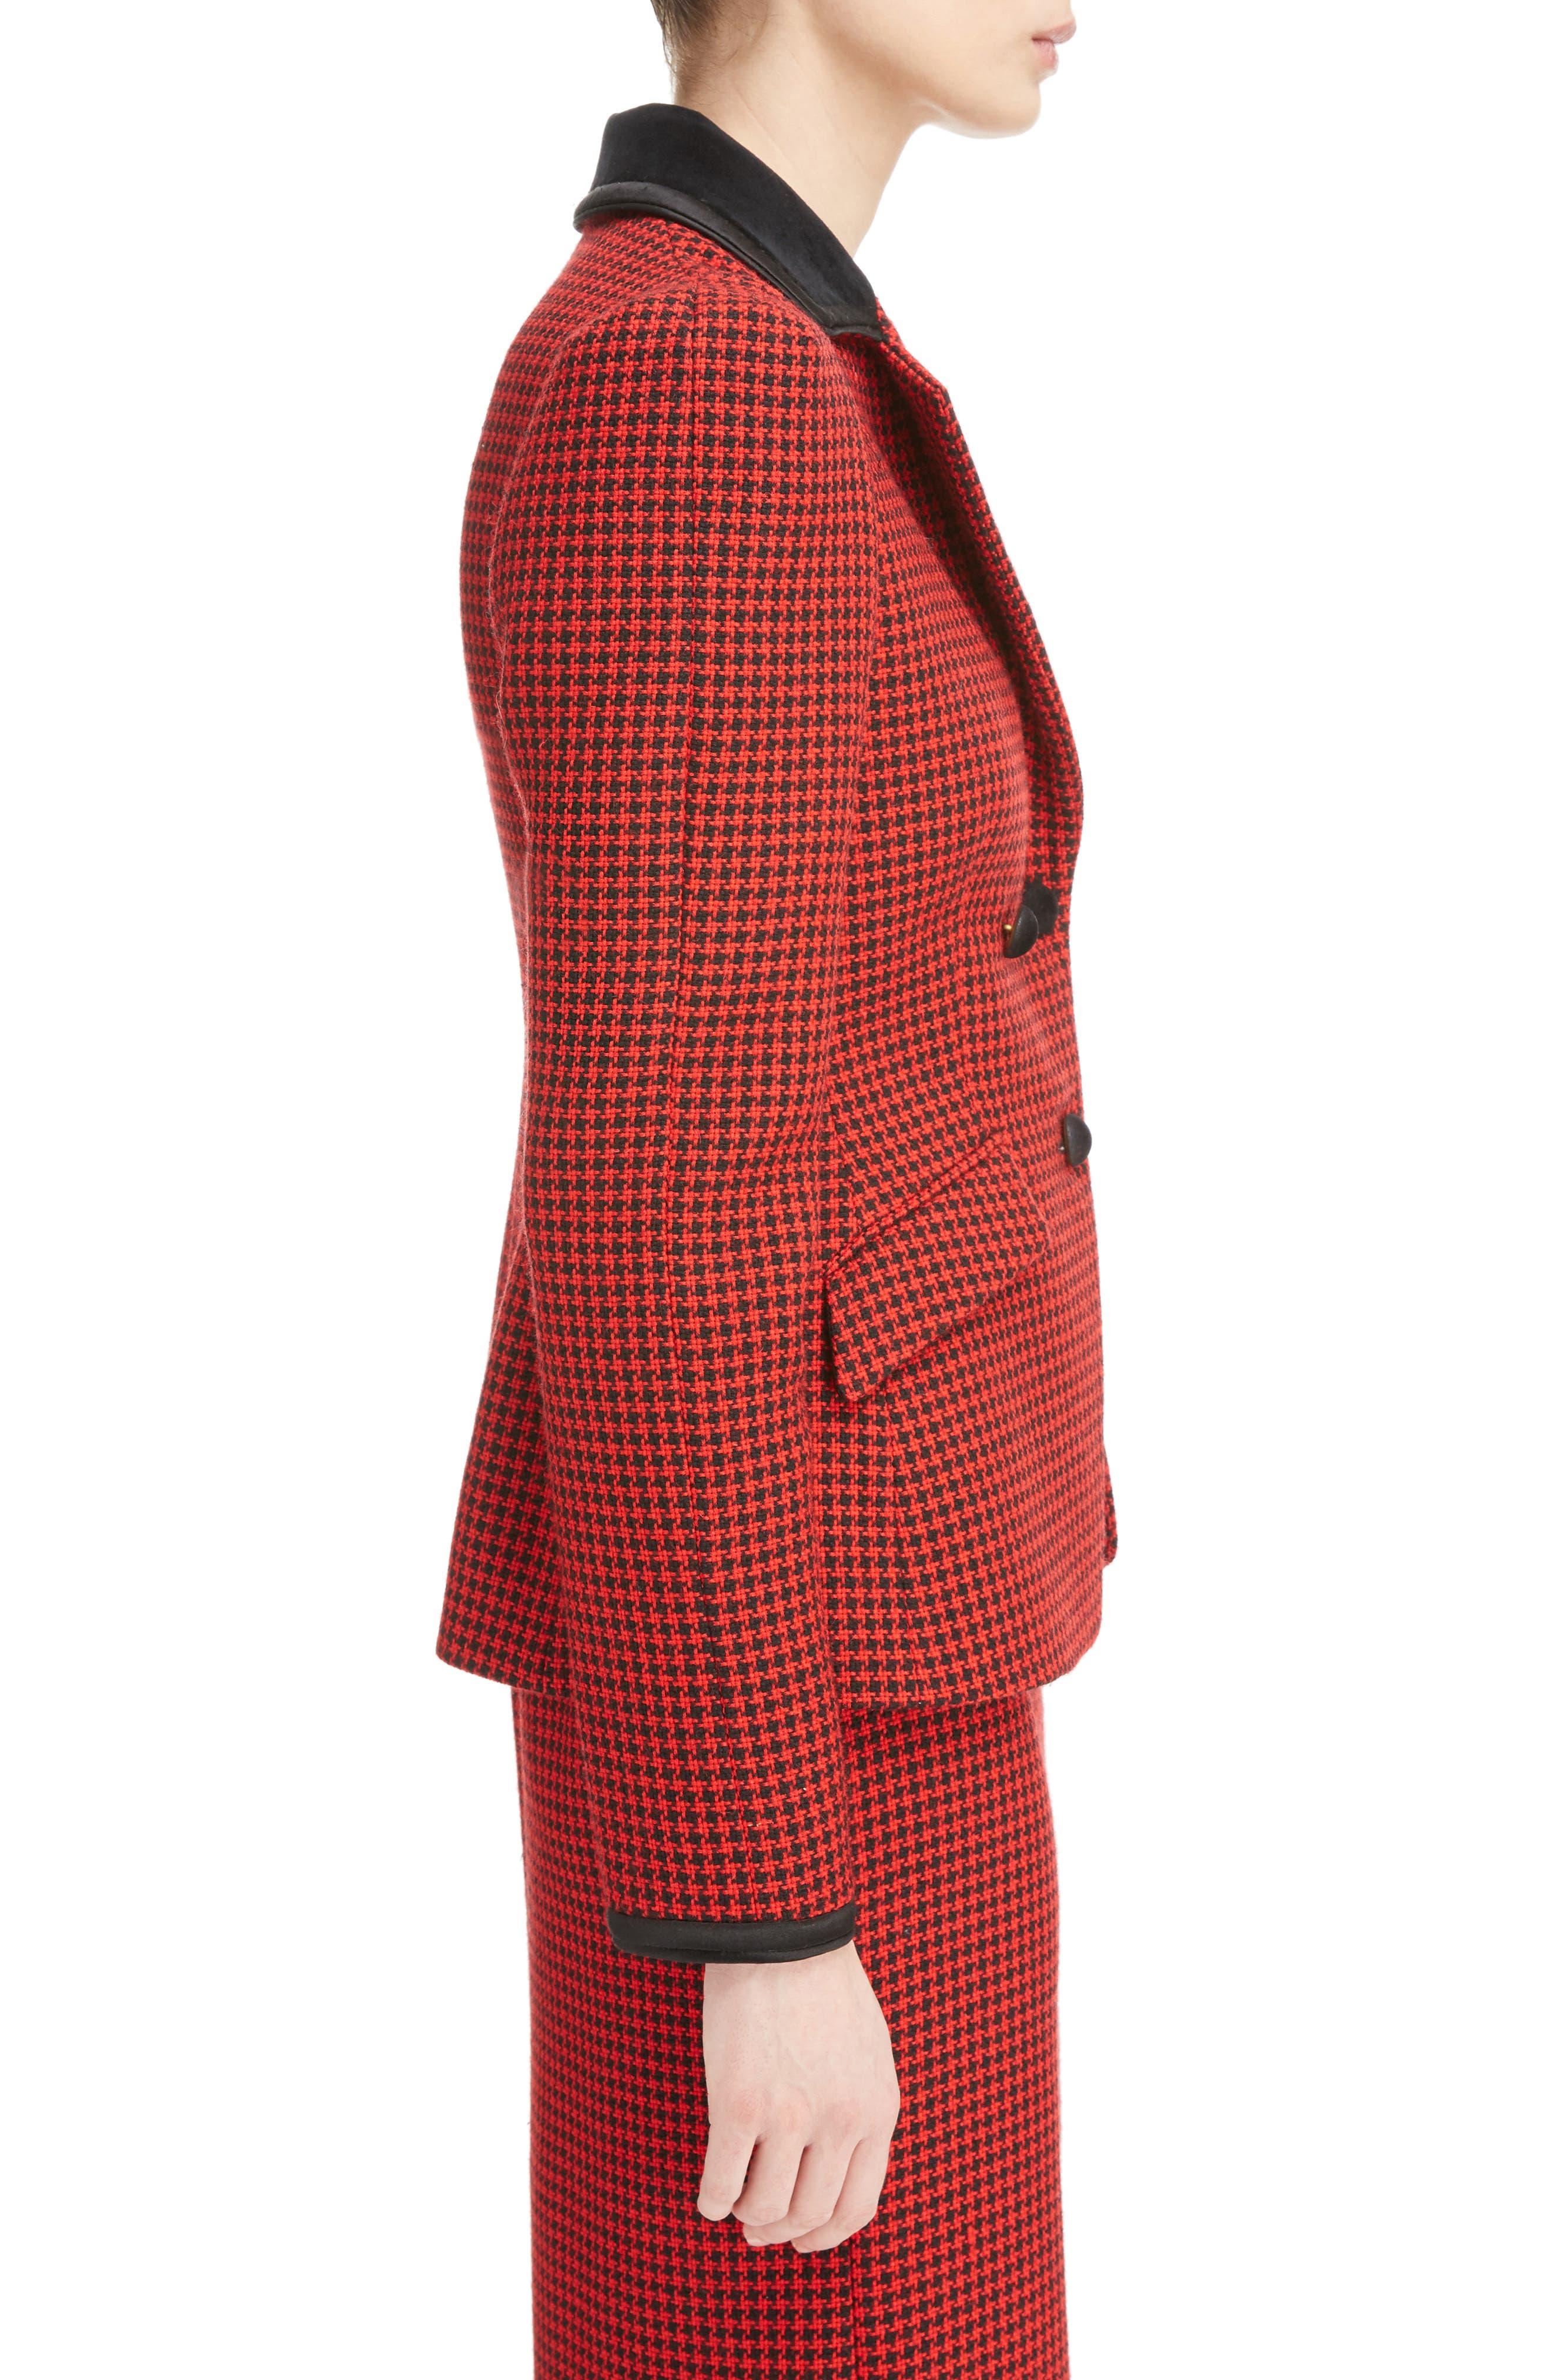 Paladini Houndstooth Wool Jacket,                             Alternate thumbnail 3, color,